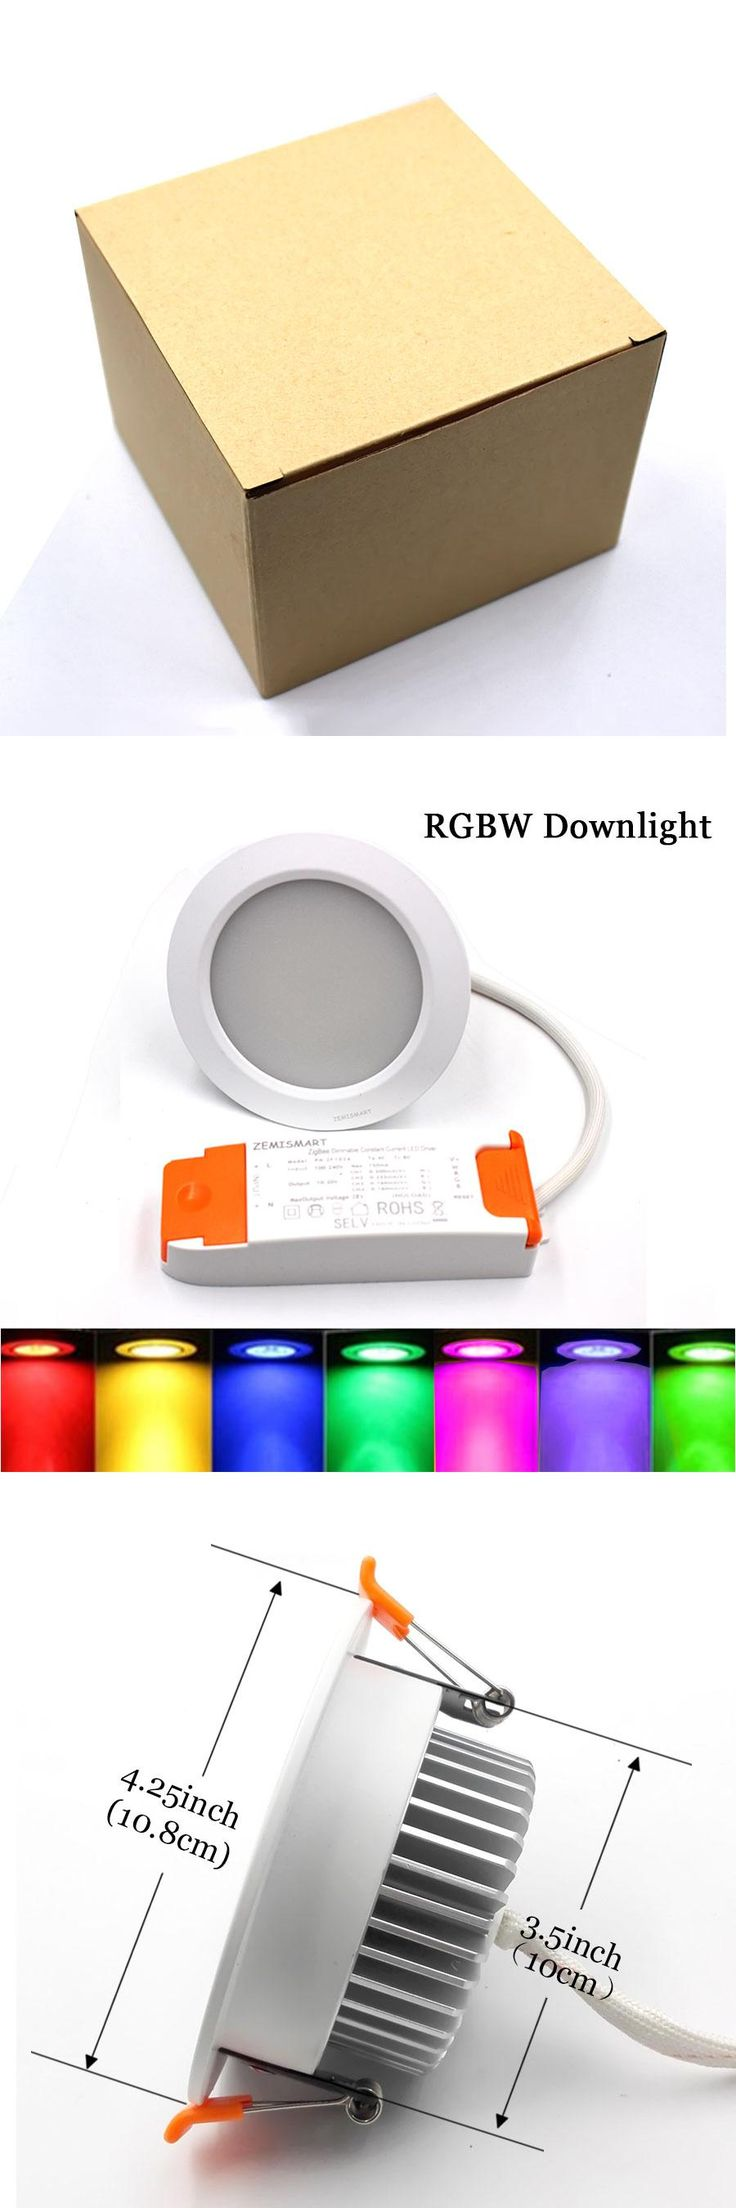 ZigBee Smart RGBW Downlight Wireless Control ZigBee Intelligent Lighting 7W 100V to 240V echo